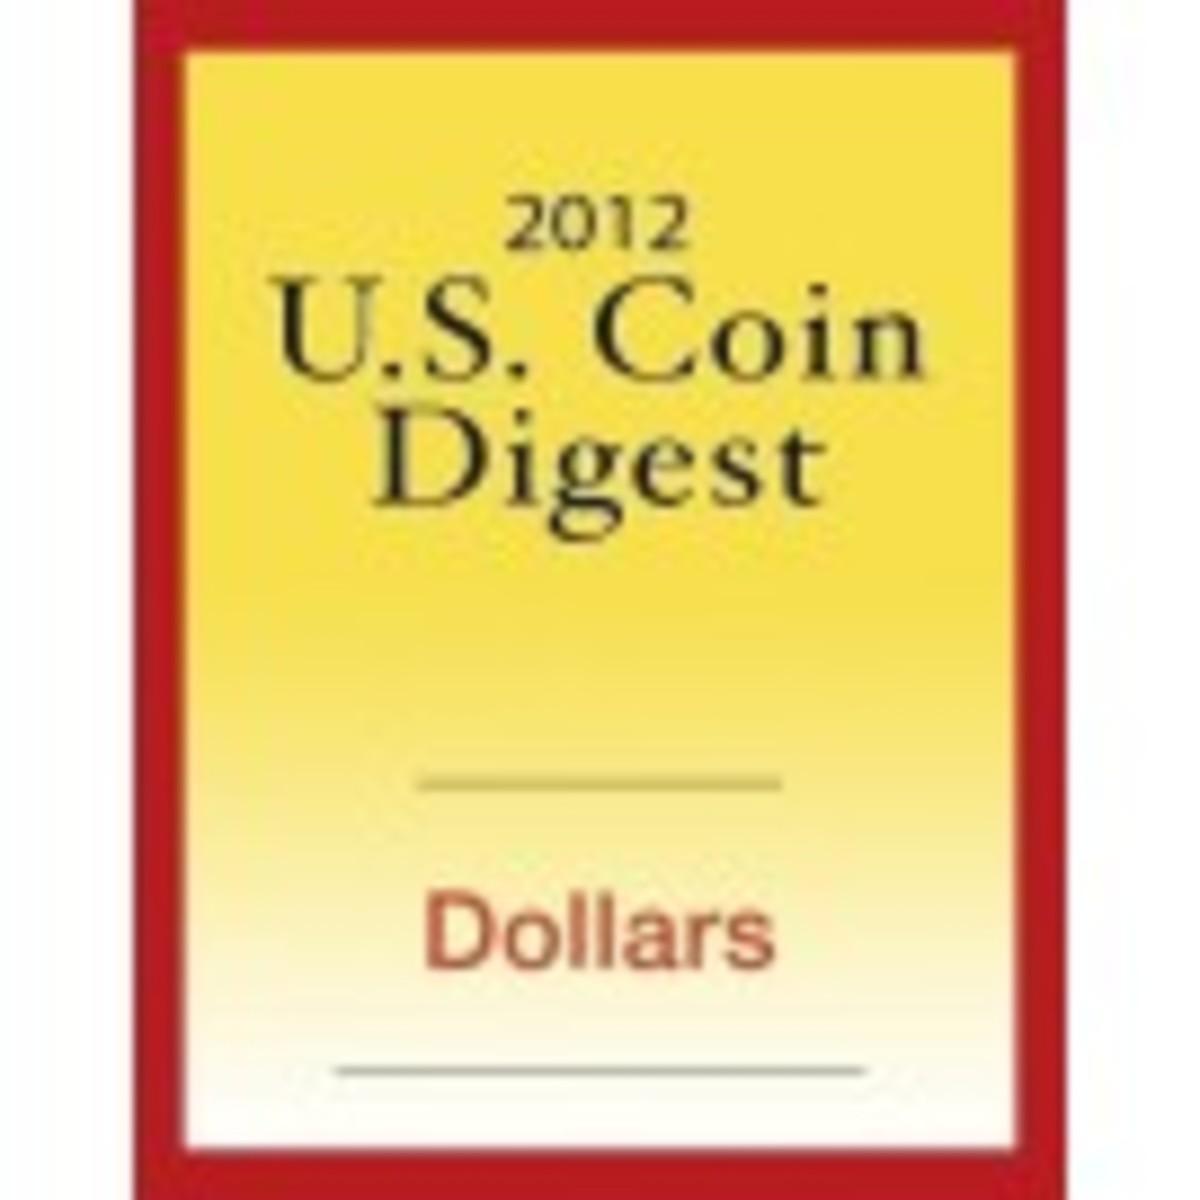 2012 U.S. Coin Digest: Dollars